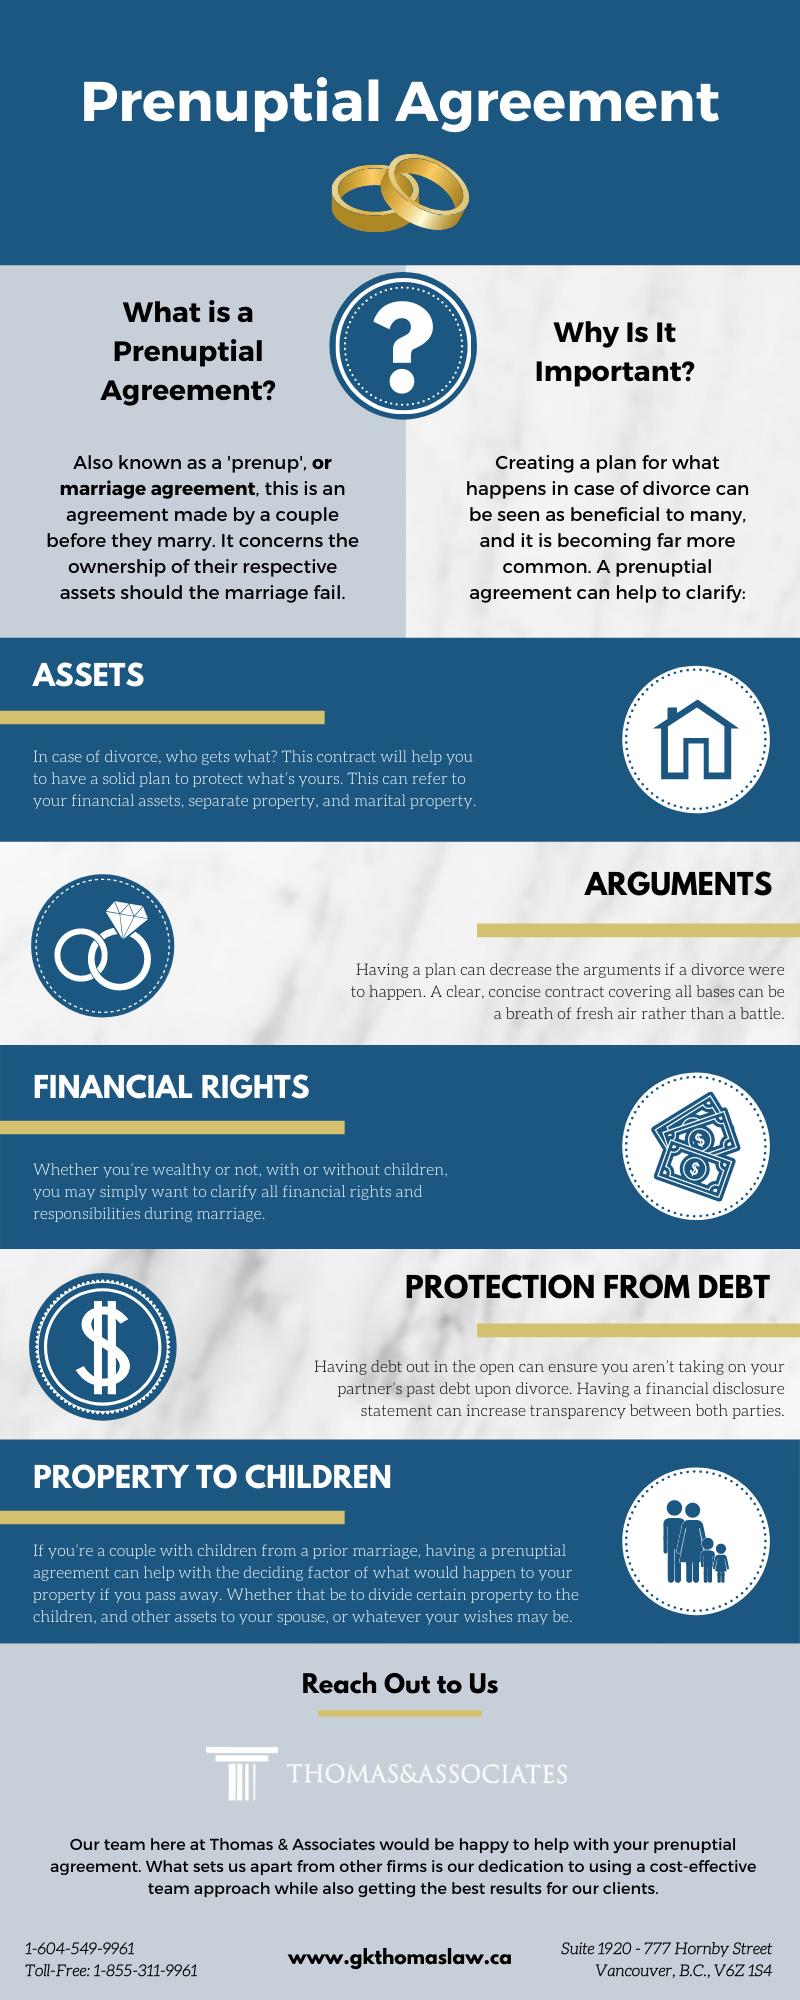 Prenuptial Agreement Infographic